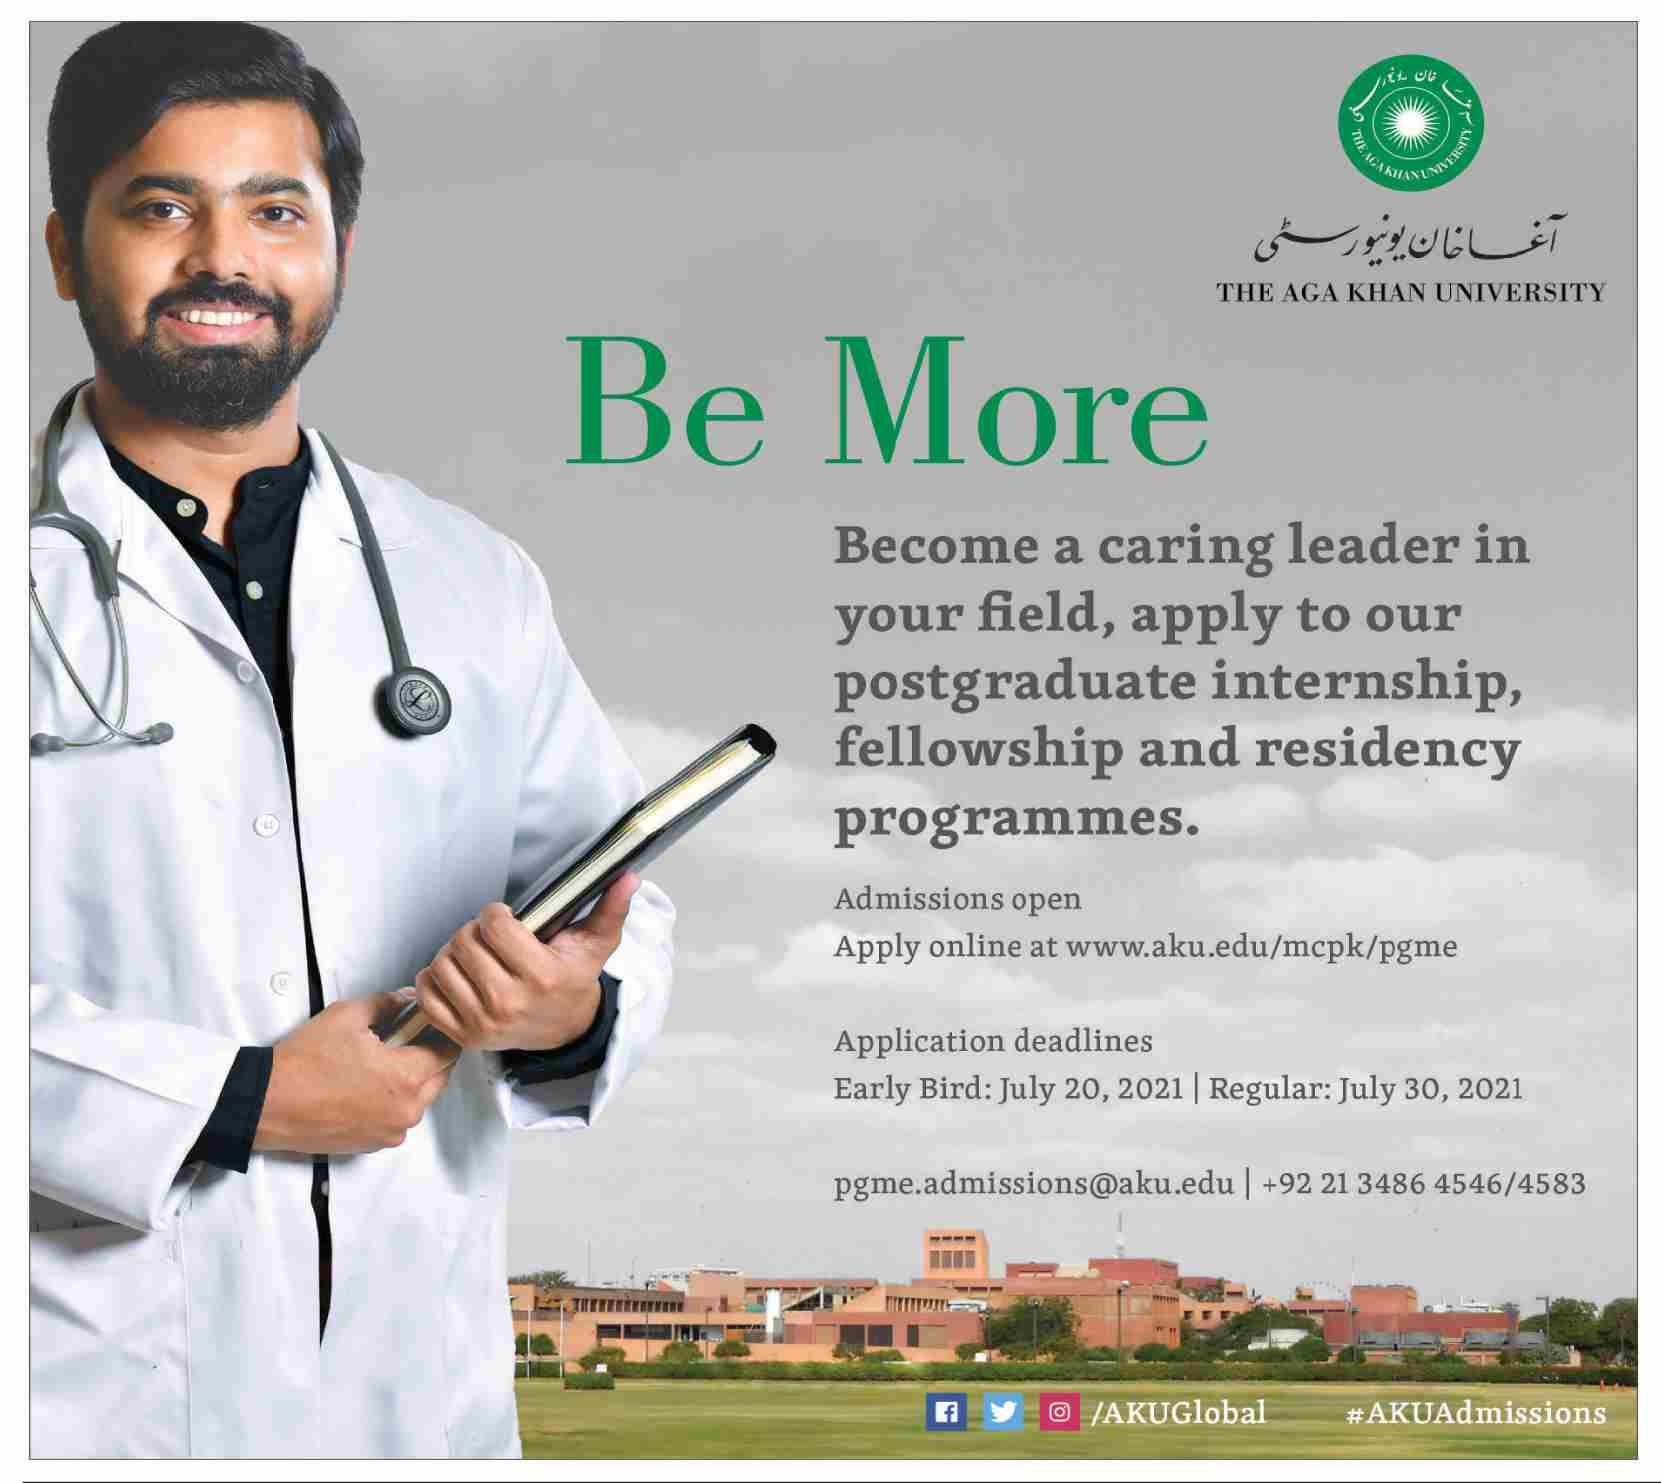 The Aga Khan University PG Internship Program